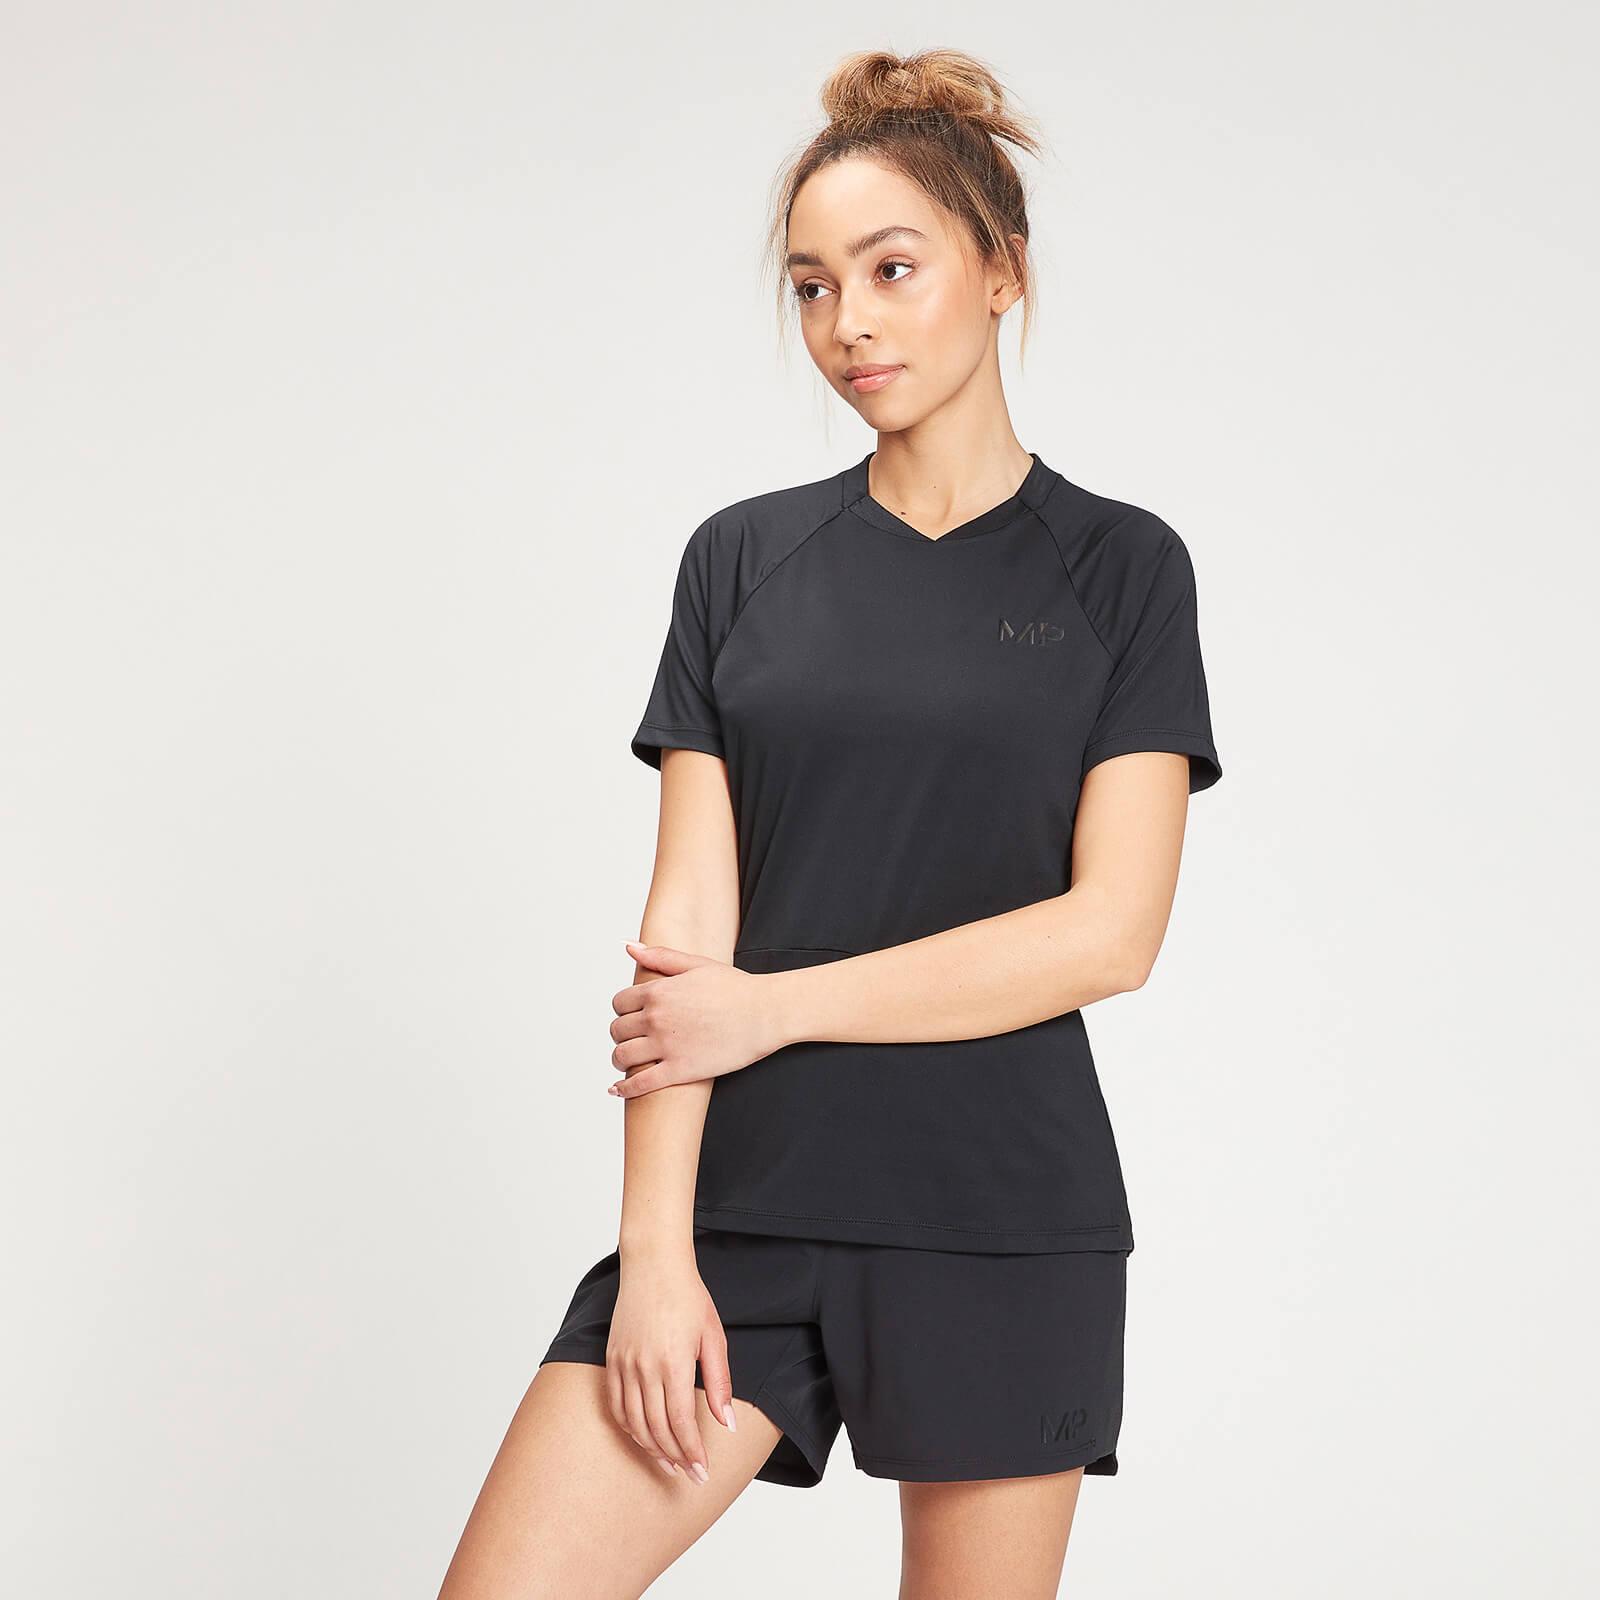 Купить MP Women's Agility Short Sleeve Top - Black - XXS, Myprotein International